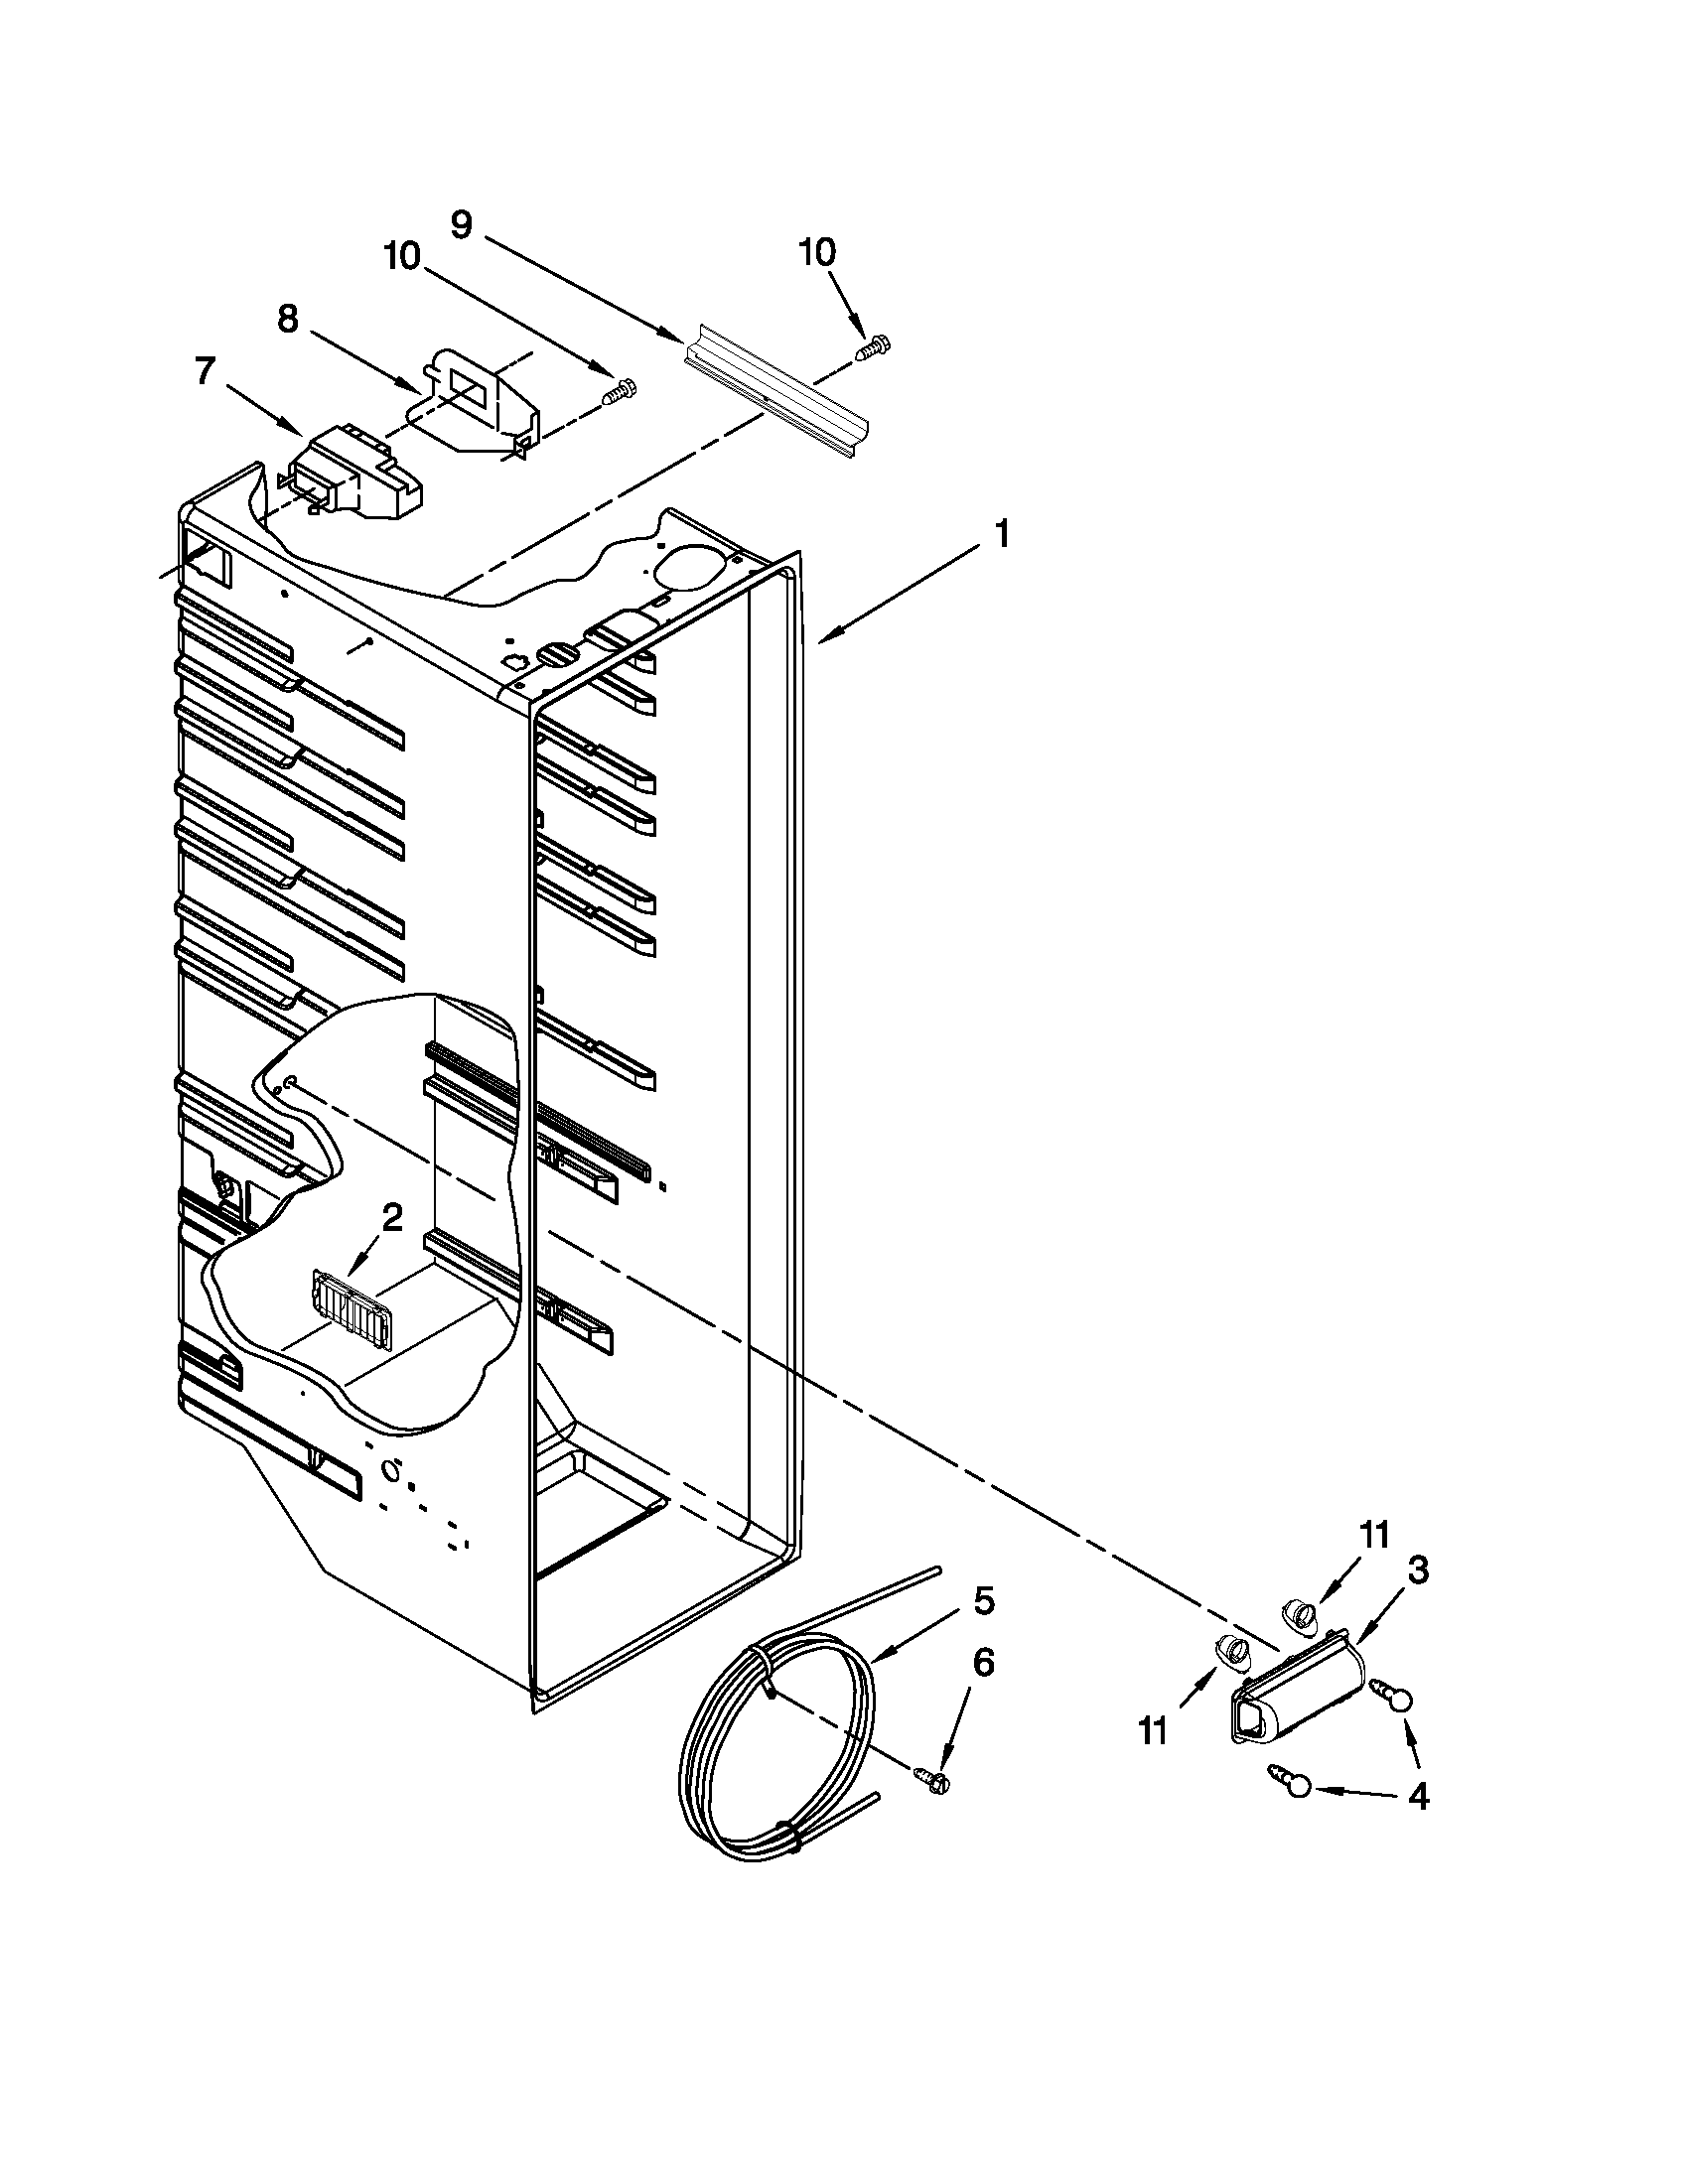 Kenmore model 10651103110 side-by-side refrigerator